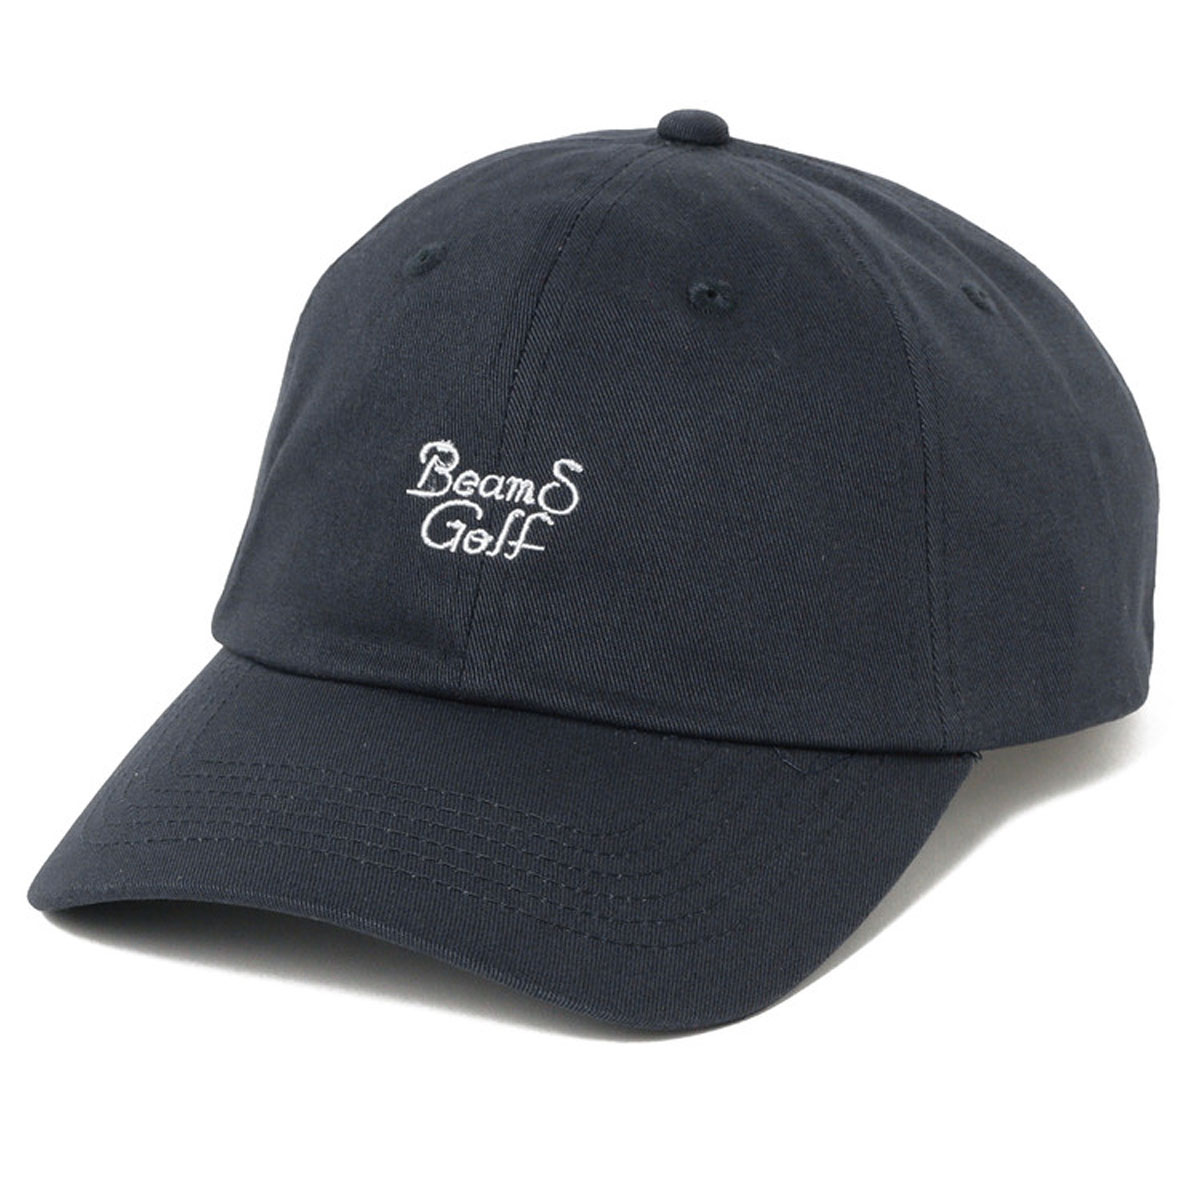 BEAMS GOLF ベースボール キャップ